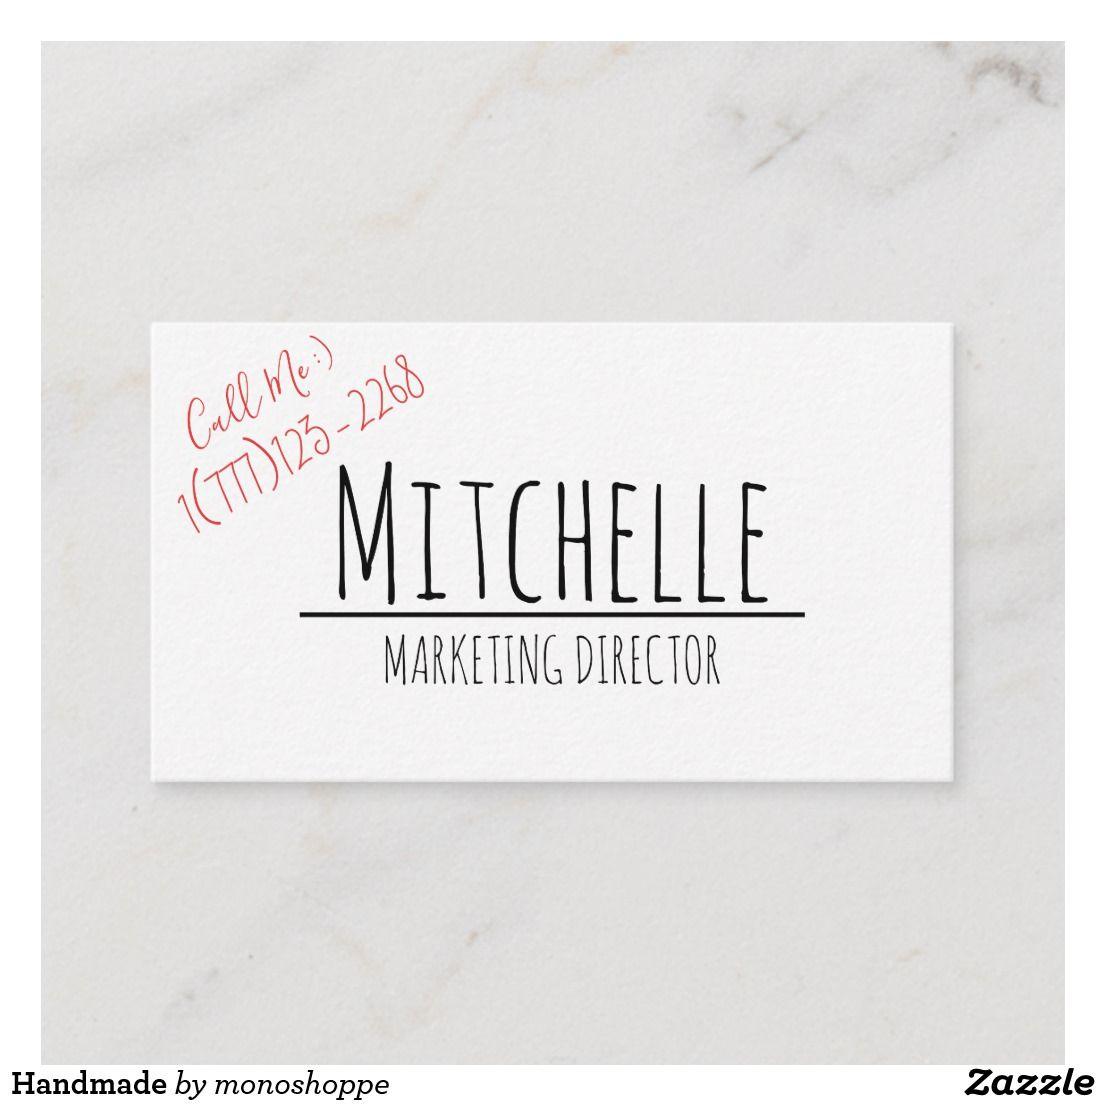 handmade business card  zazzle  handmade business